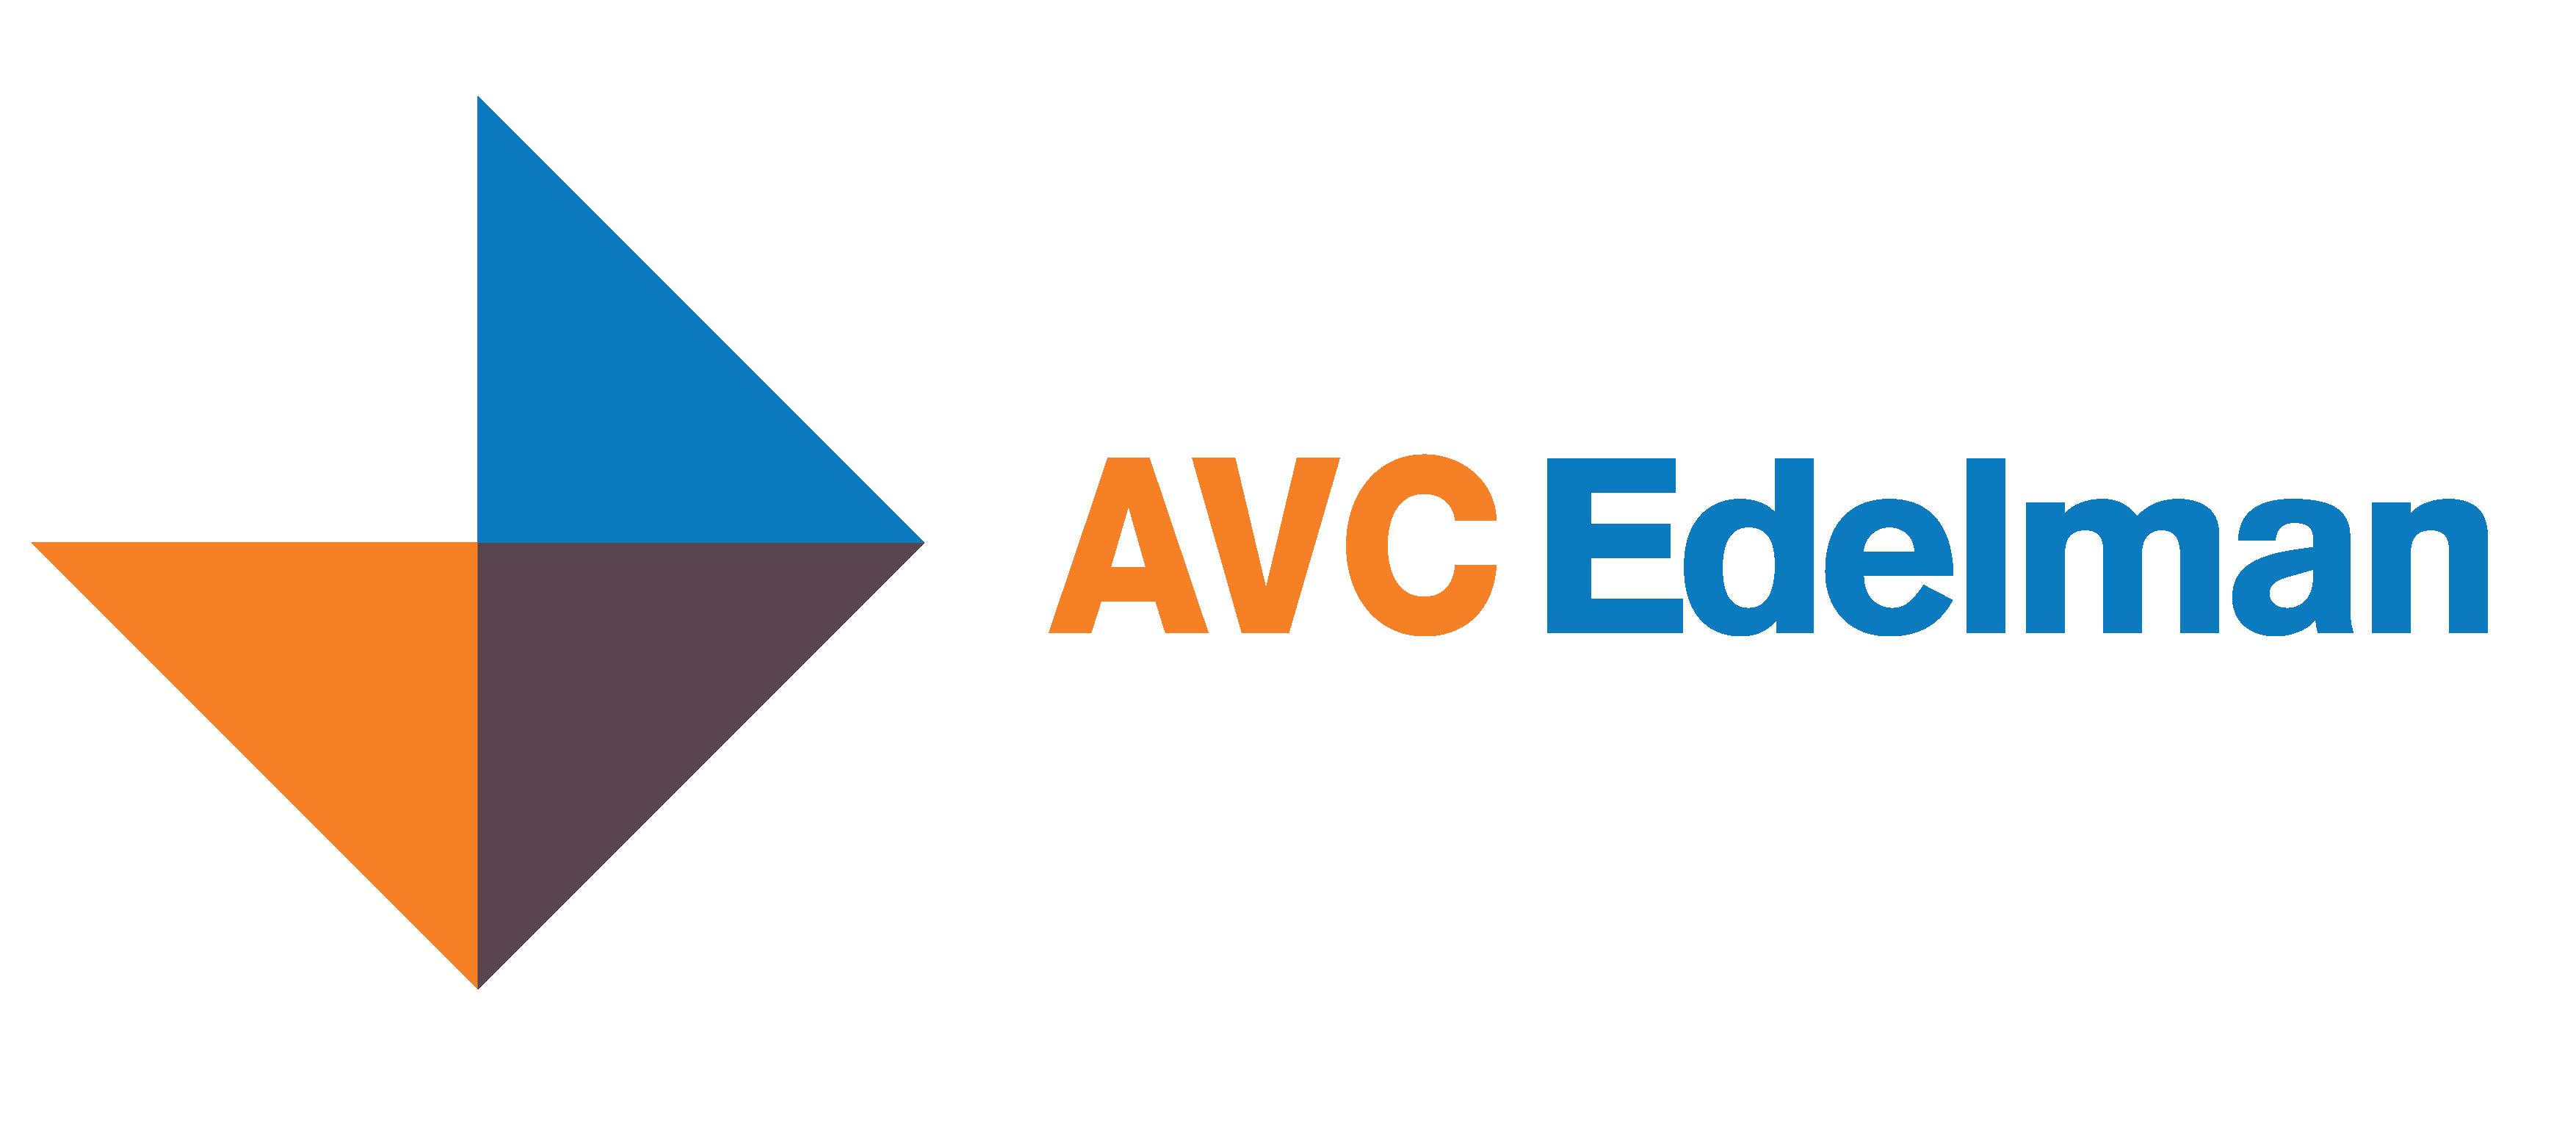 AVC Edelman